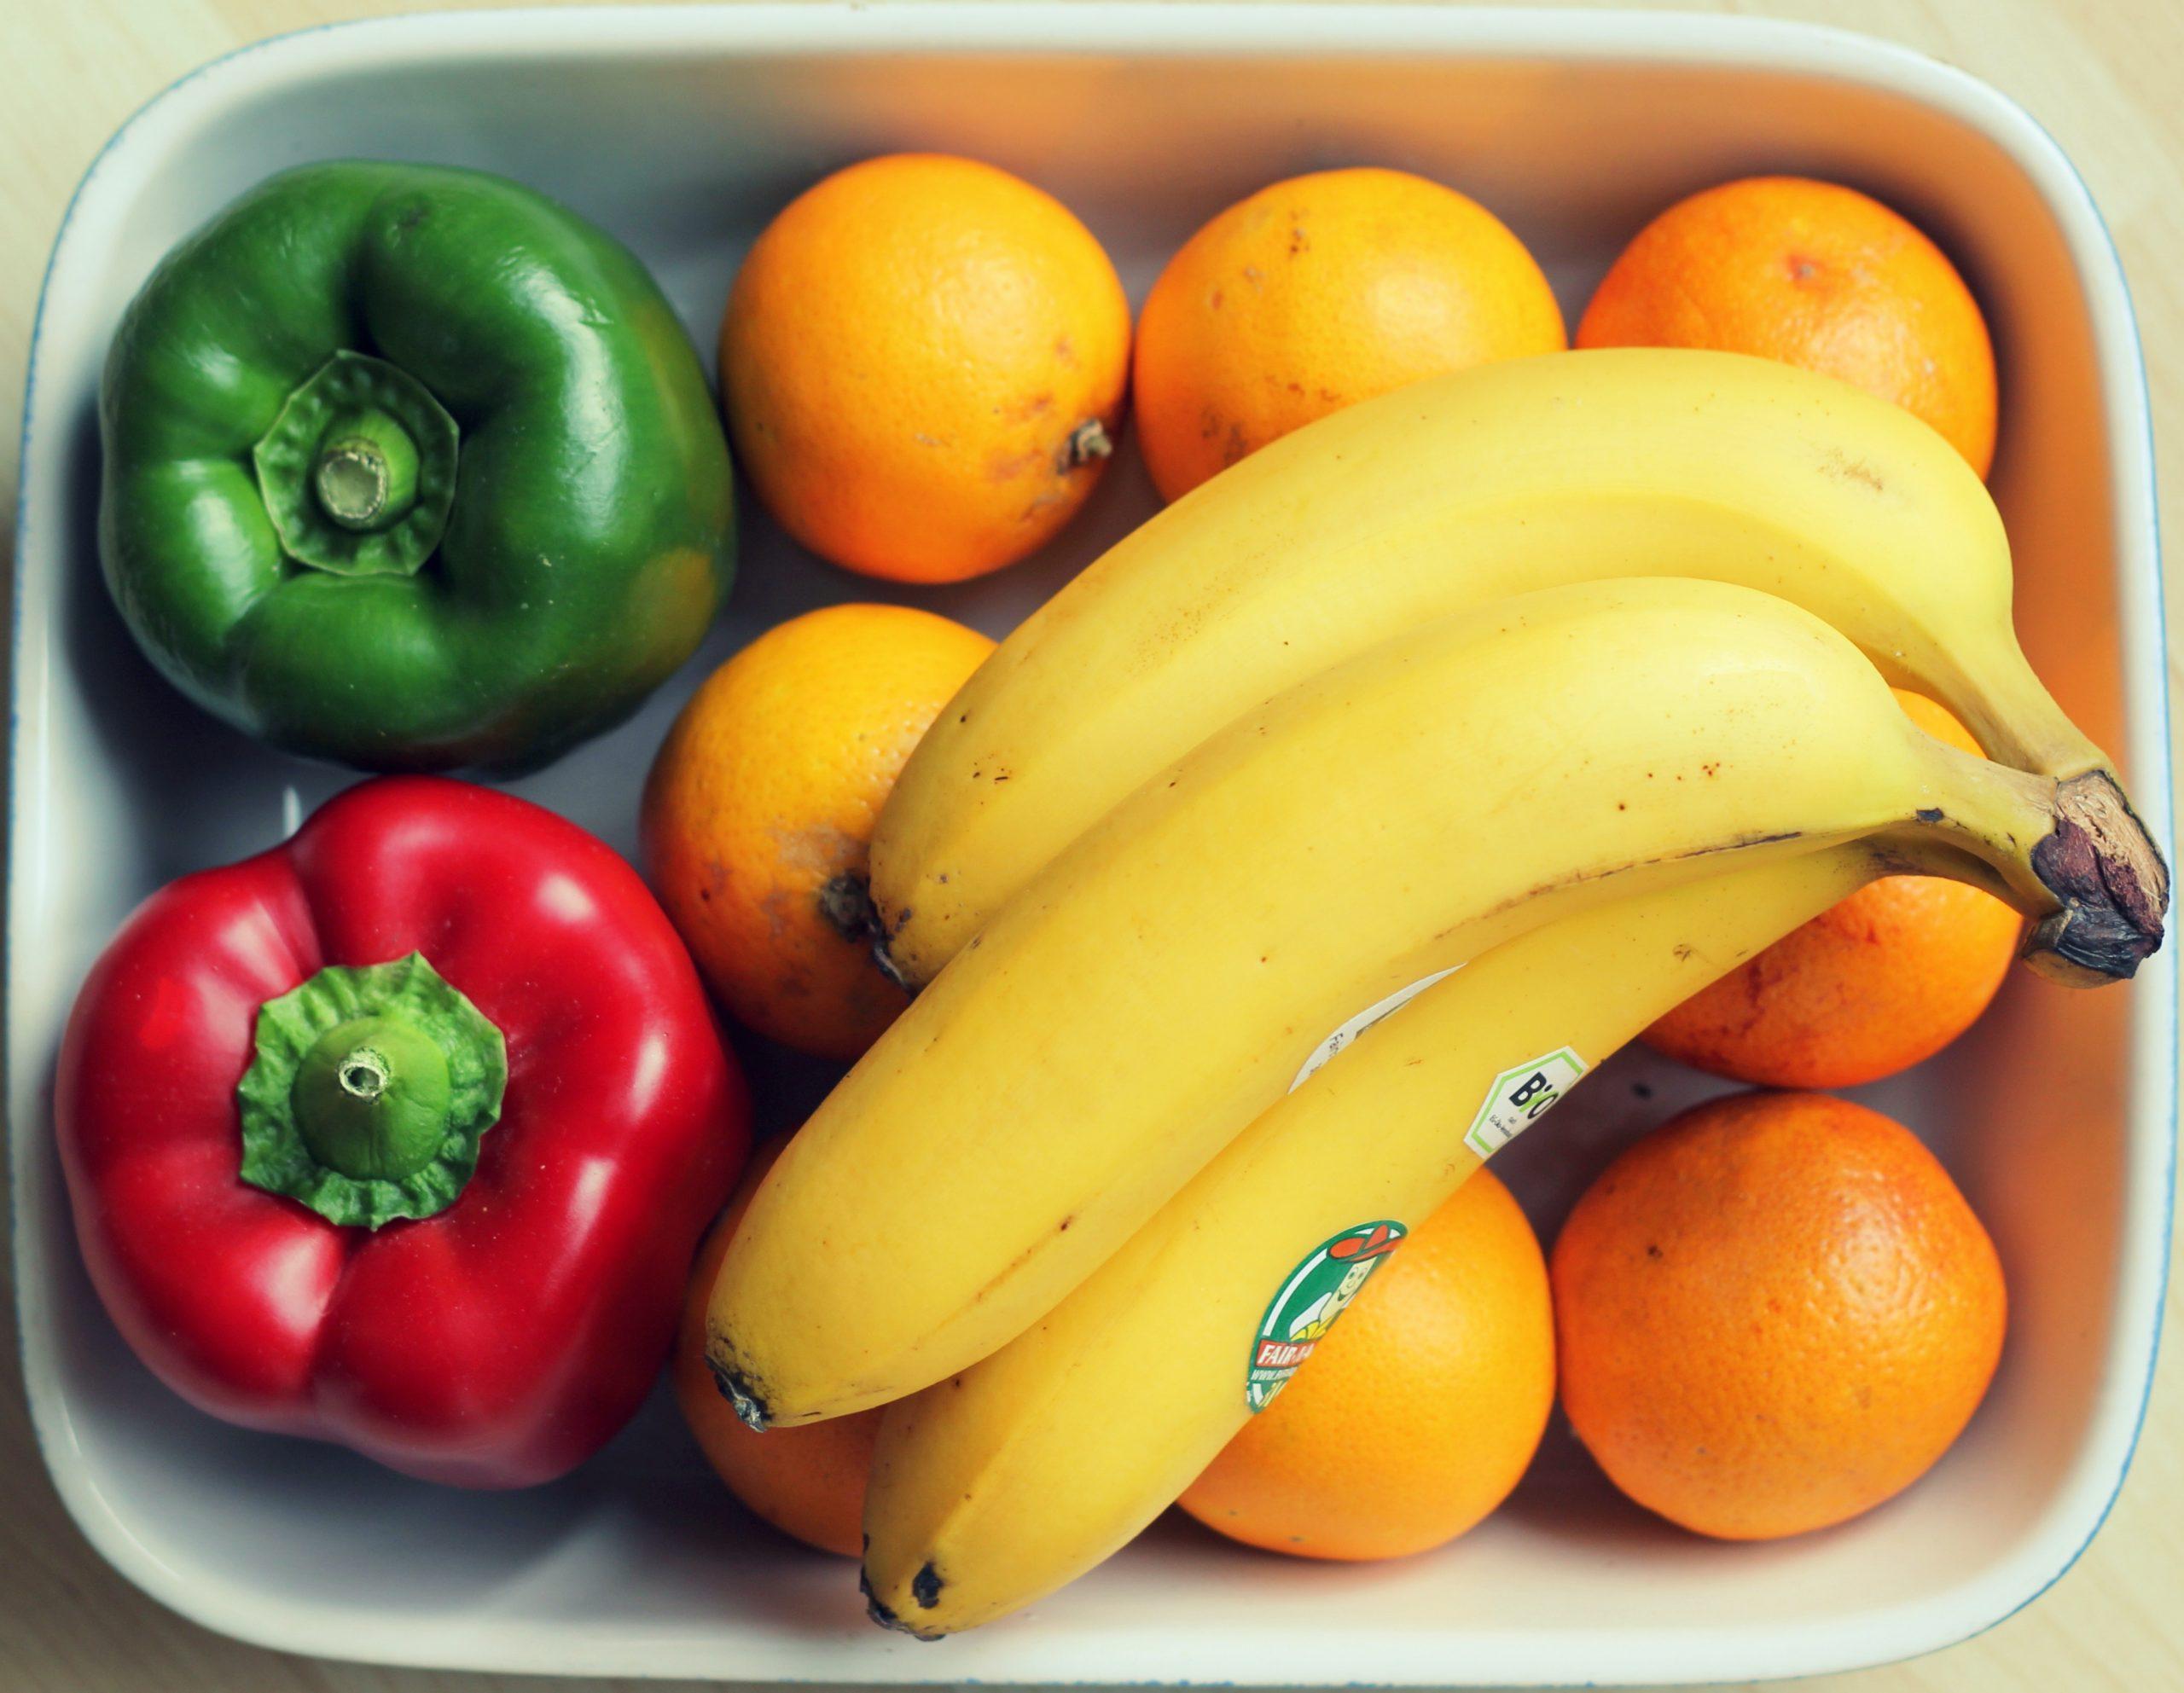 fruits-orange-banana-57556